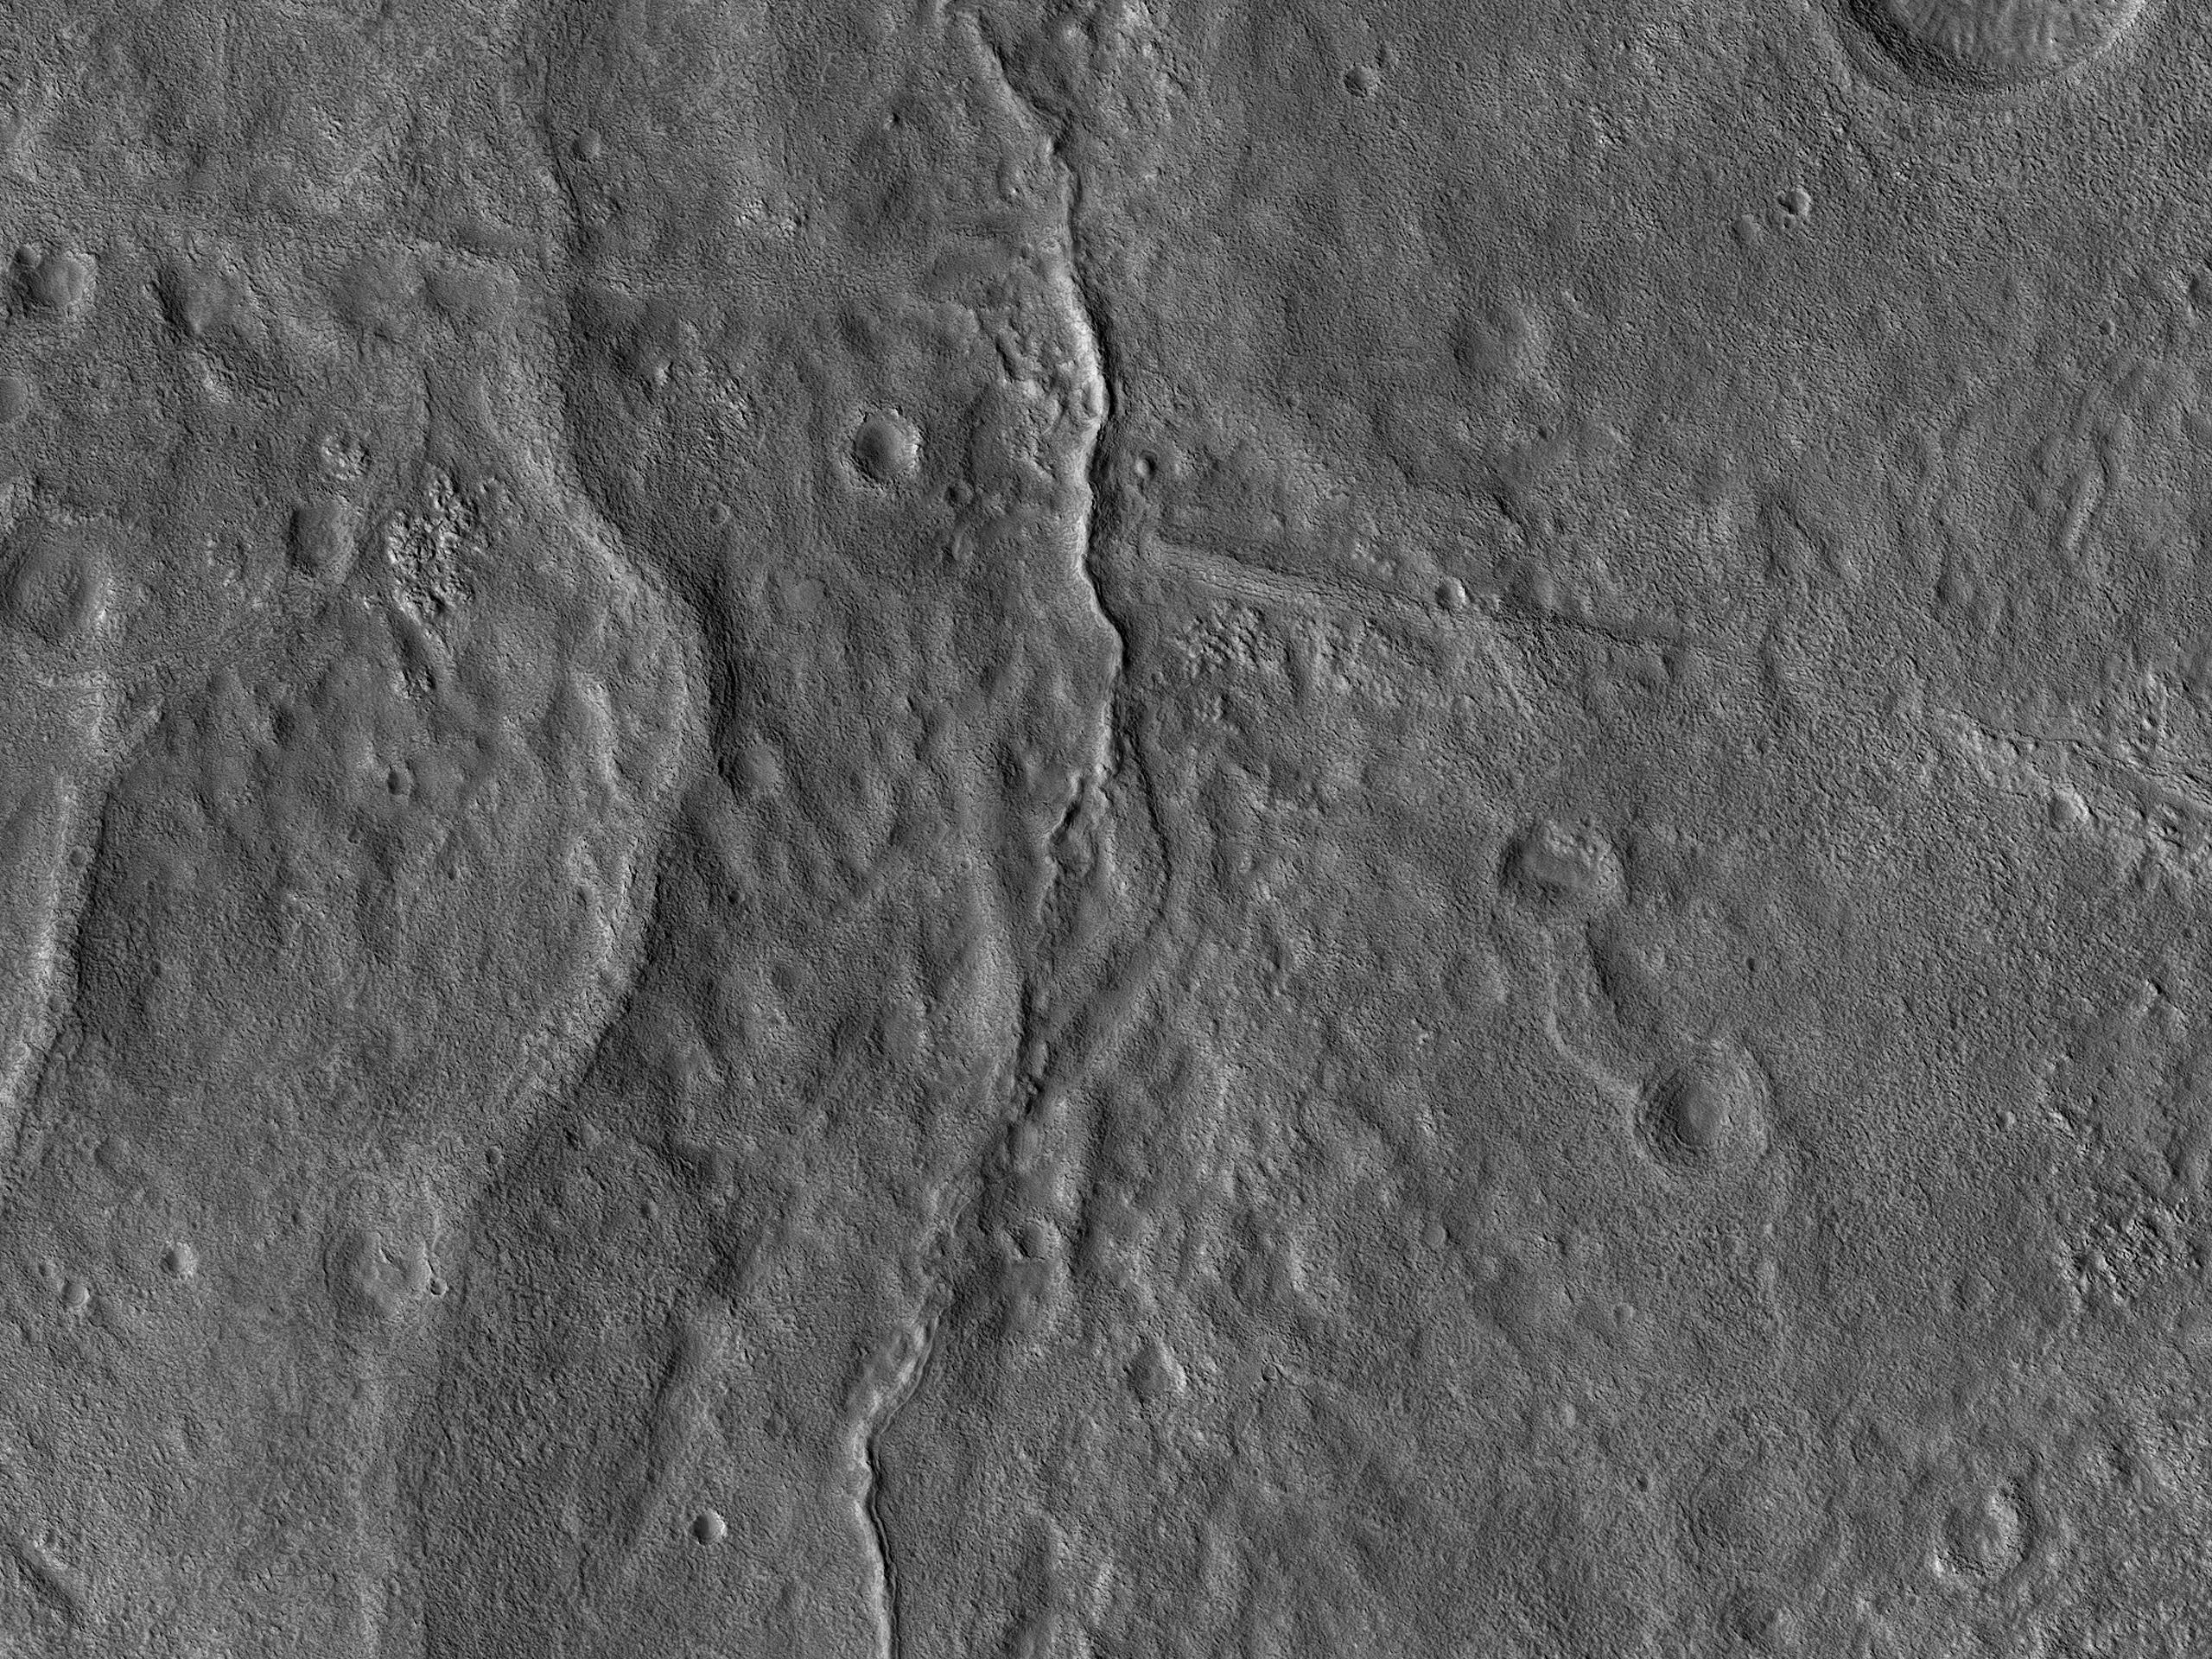 Cross-Cutting Ridges in Tempe Terra